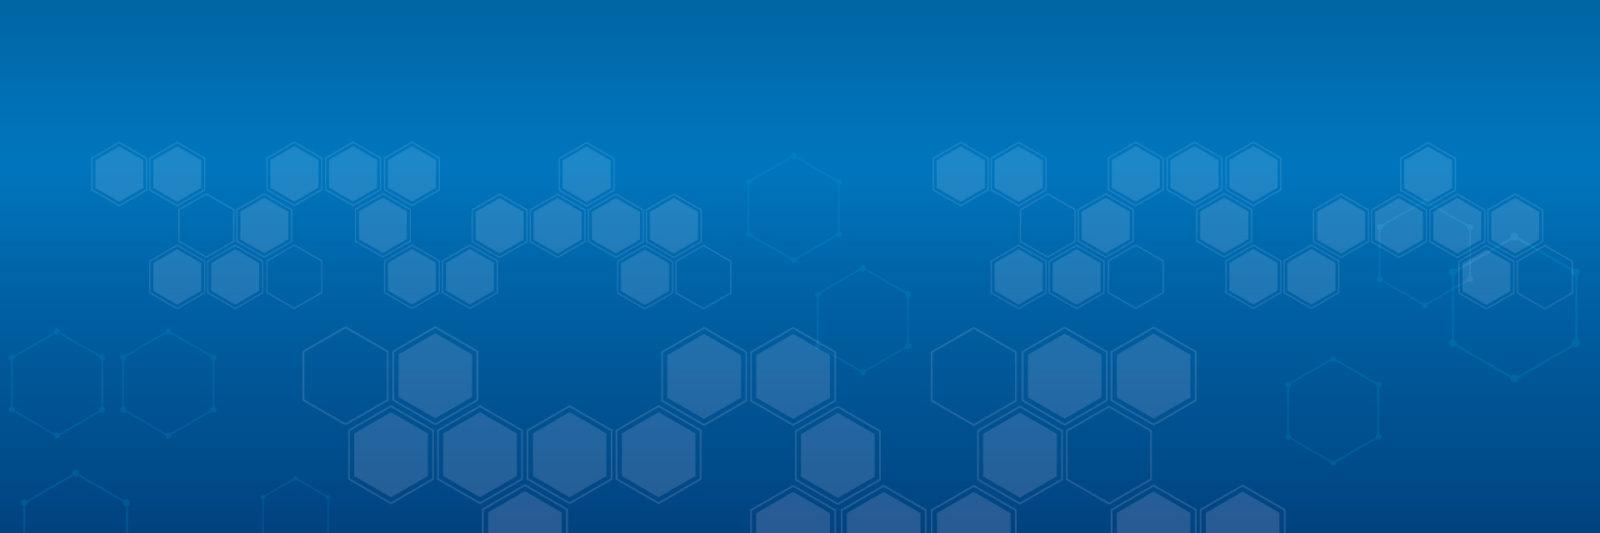 iST_bhex1920x1080_BlueTitle2